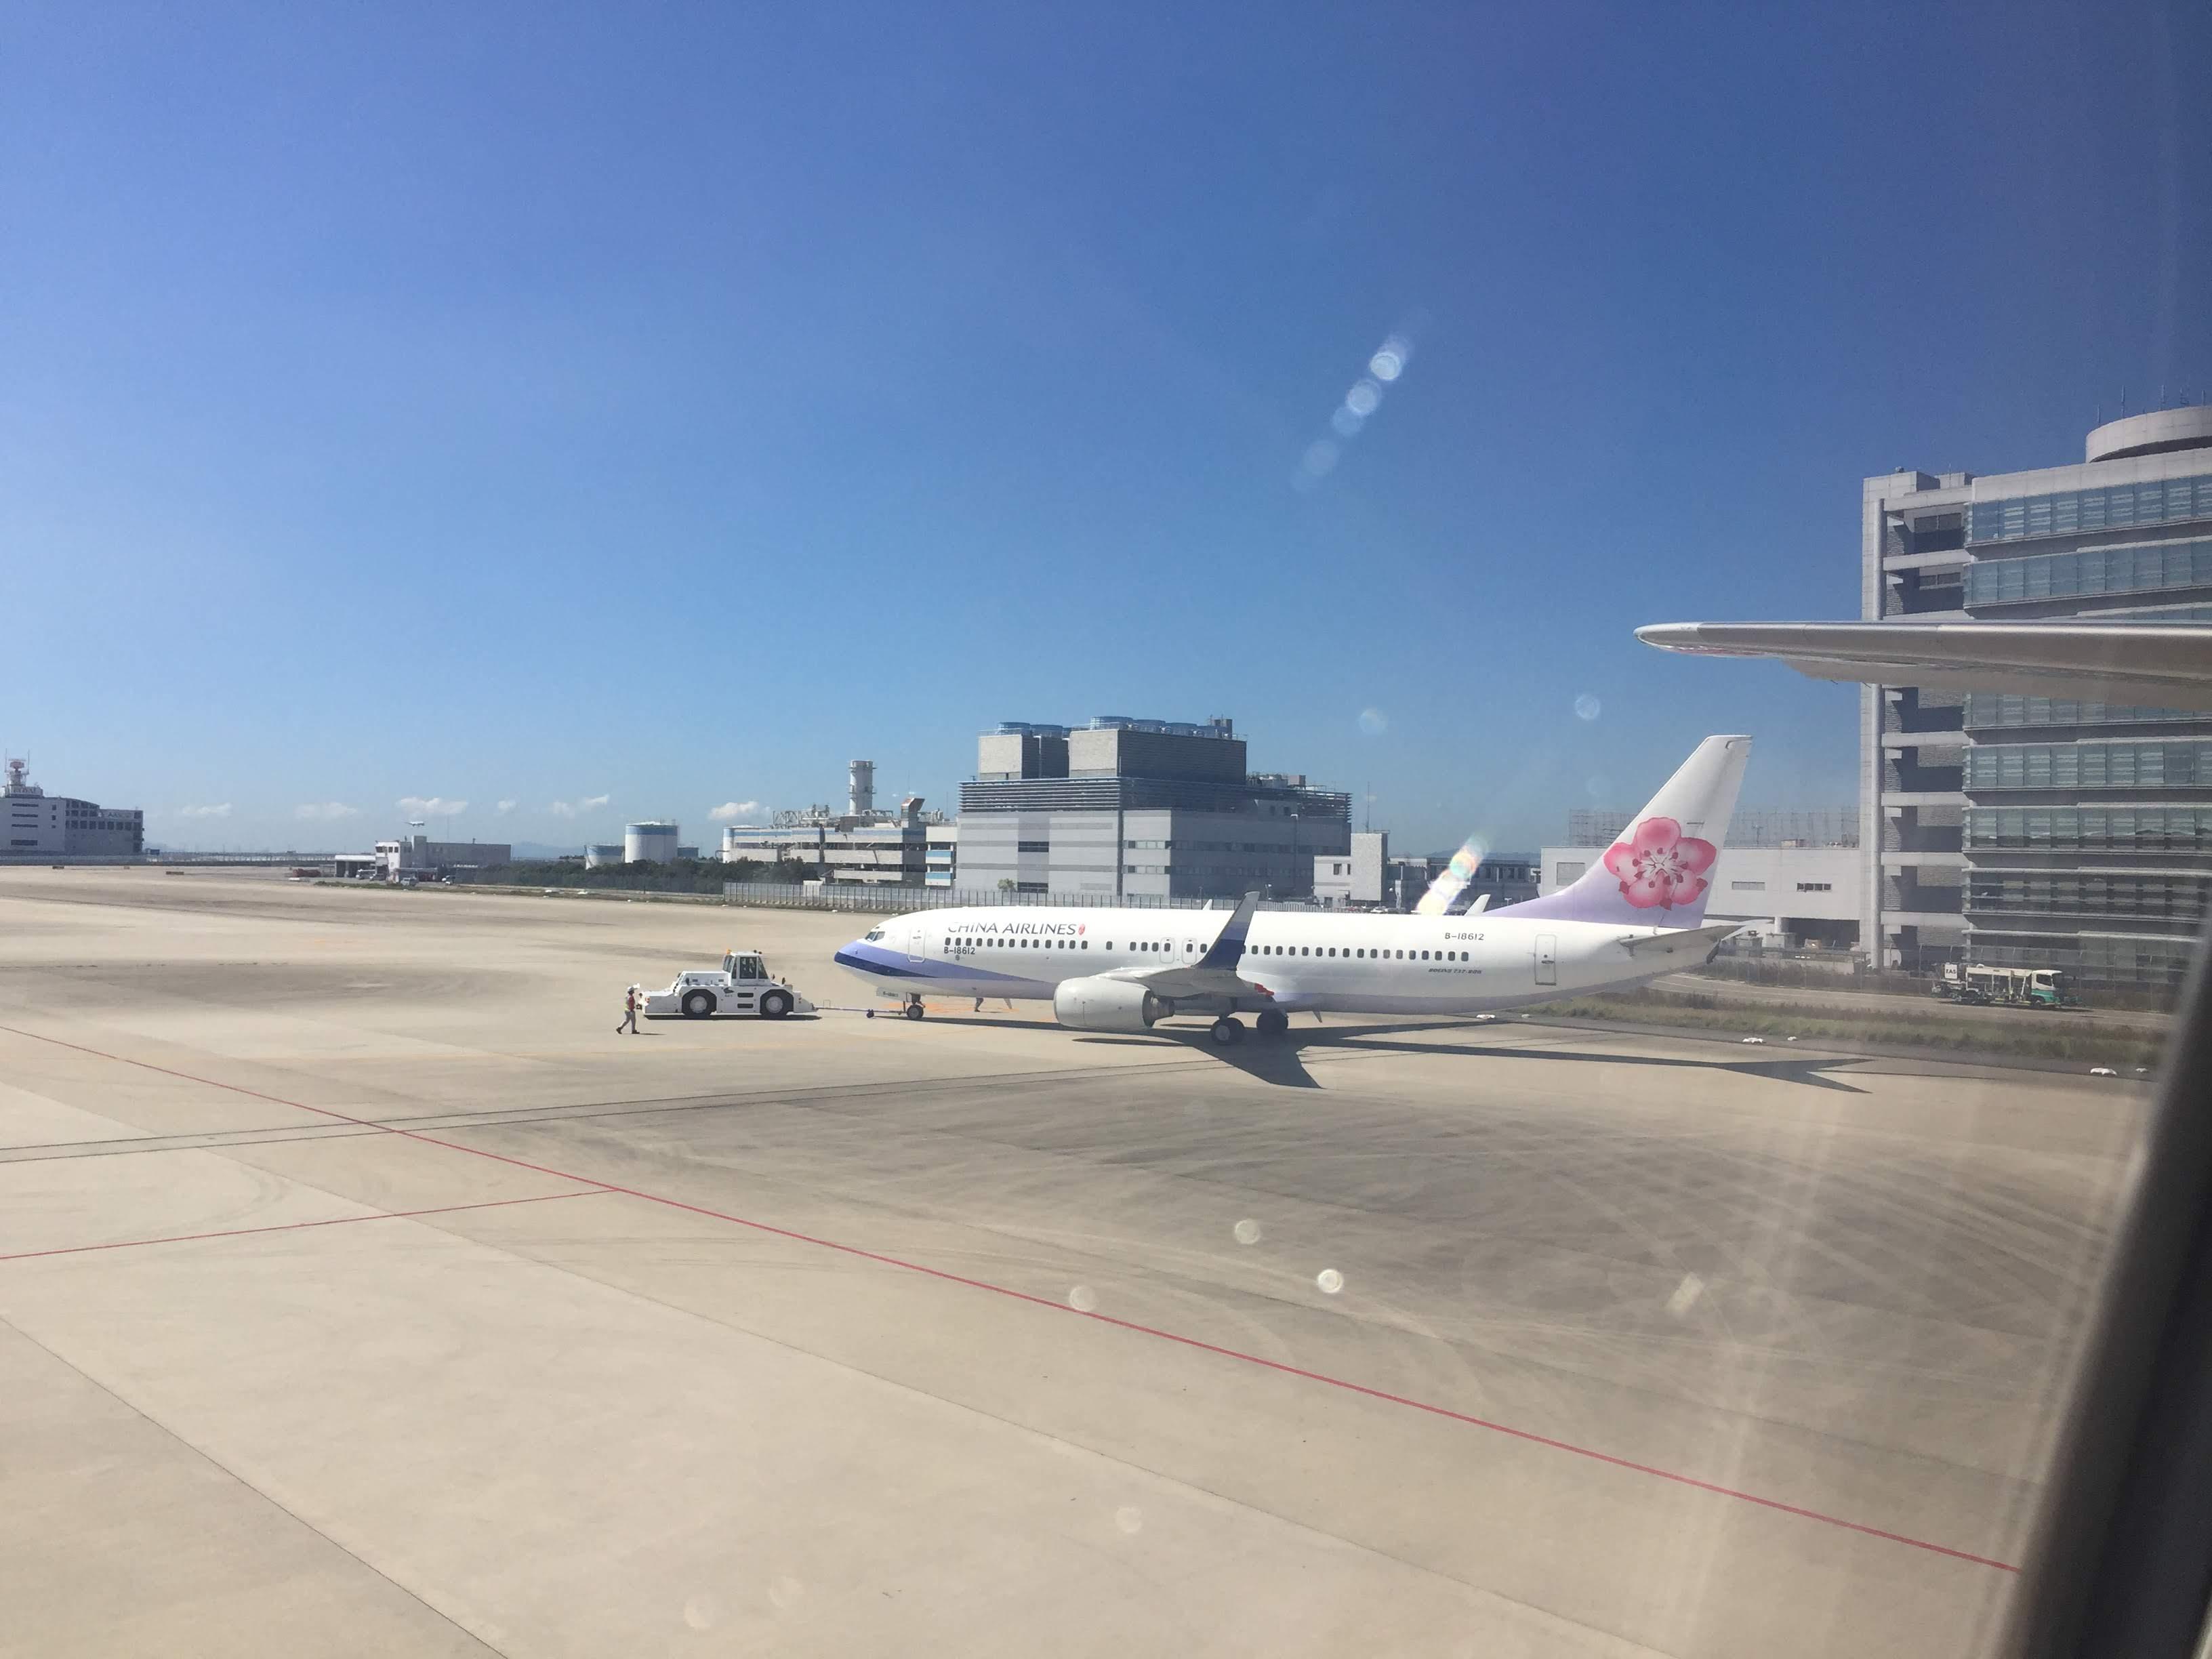 Taifunwarnung für Osaka | story.one